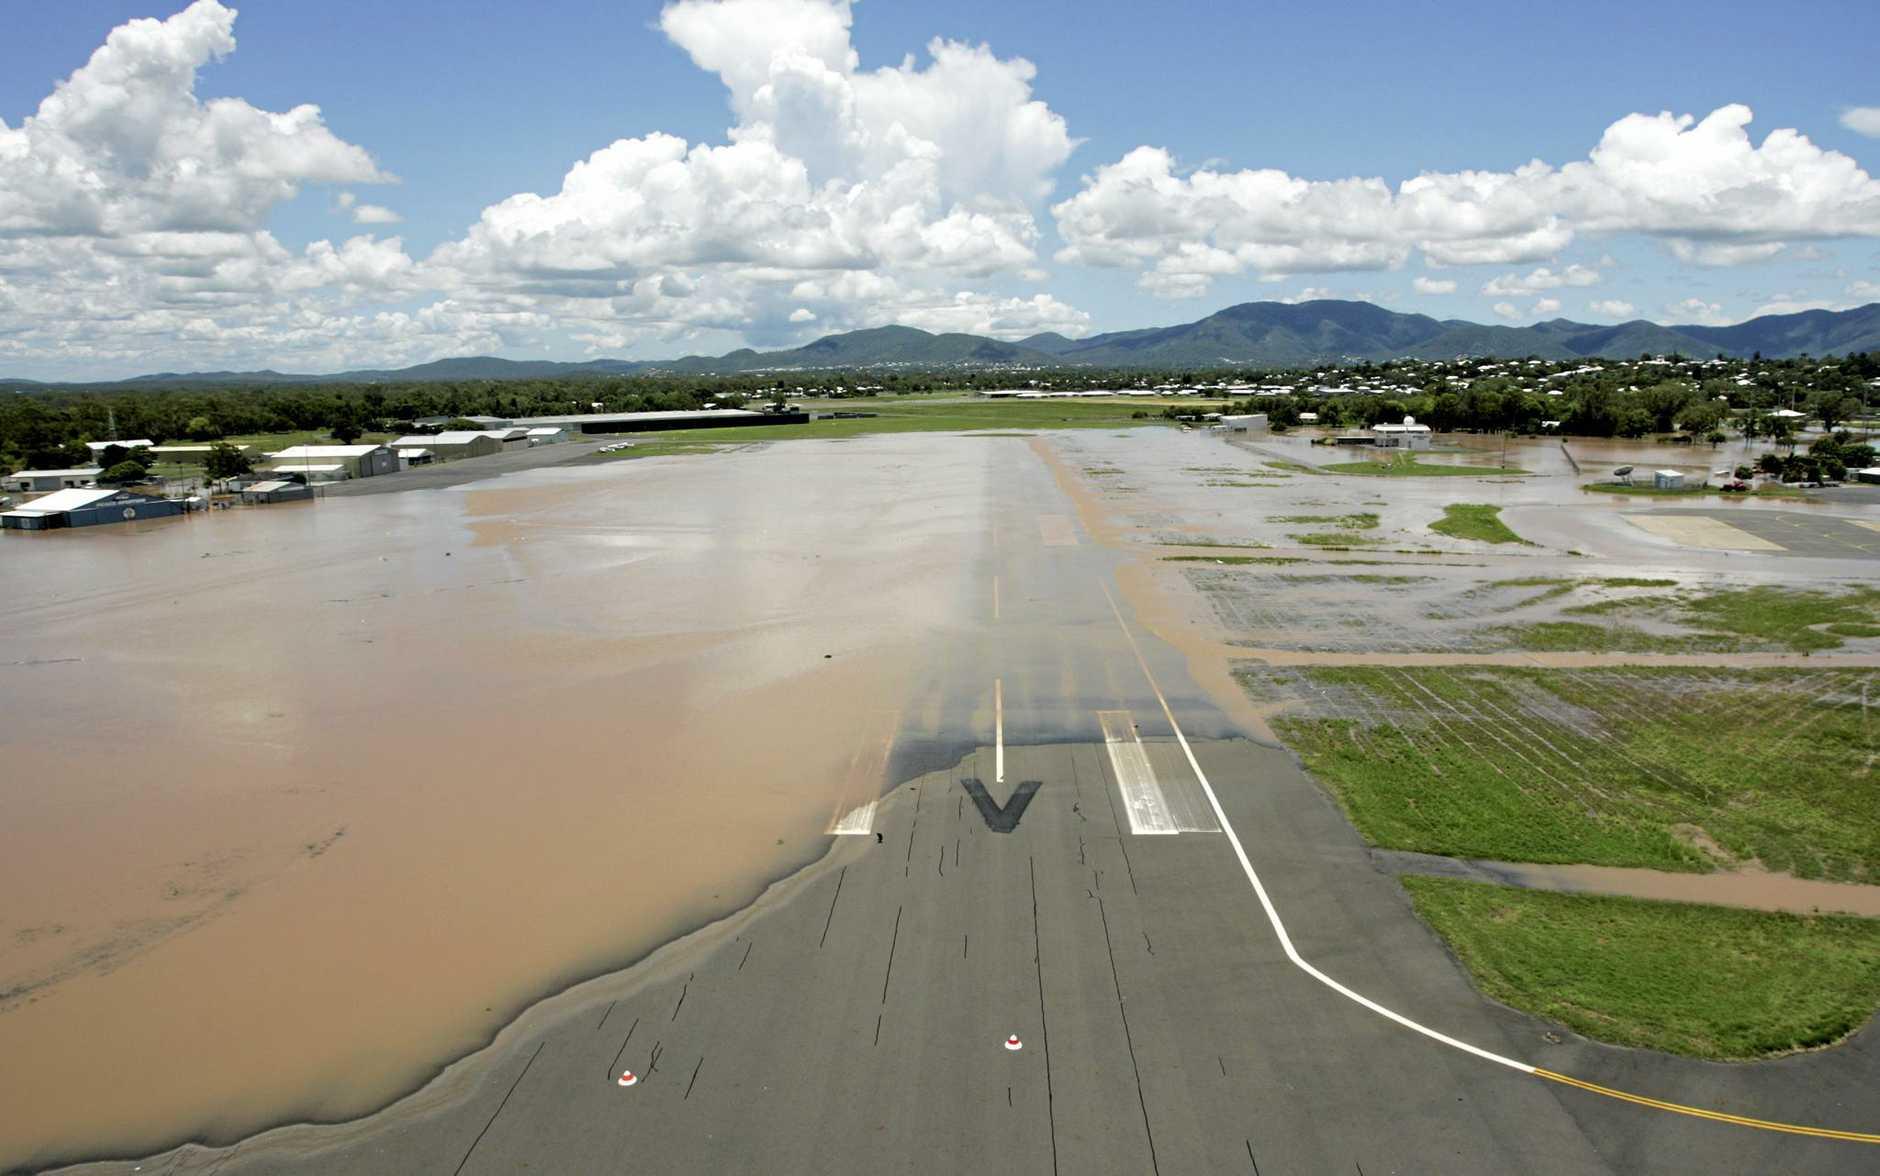 PHOTO FROM 2011: Rockhampton airport